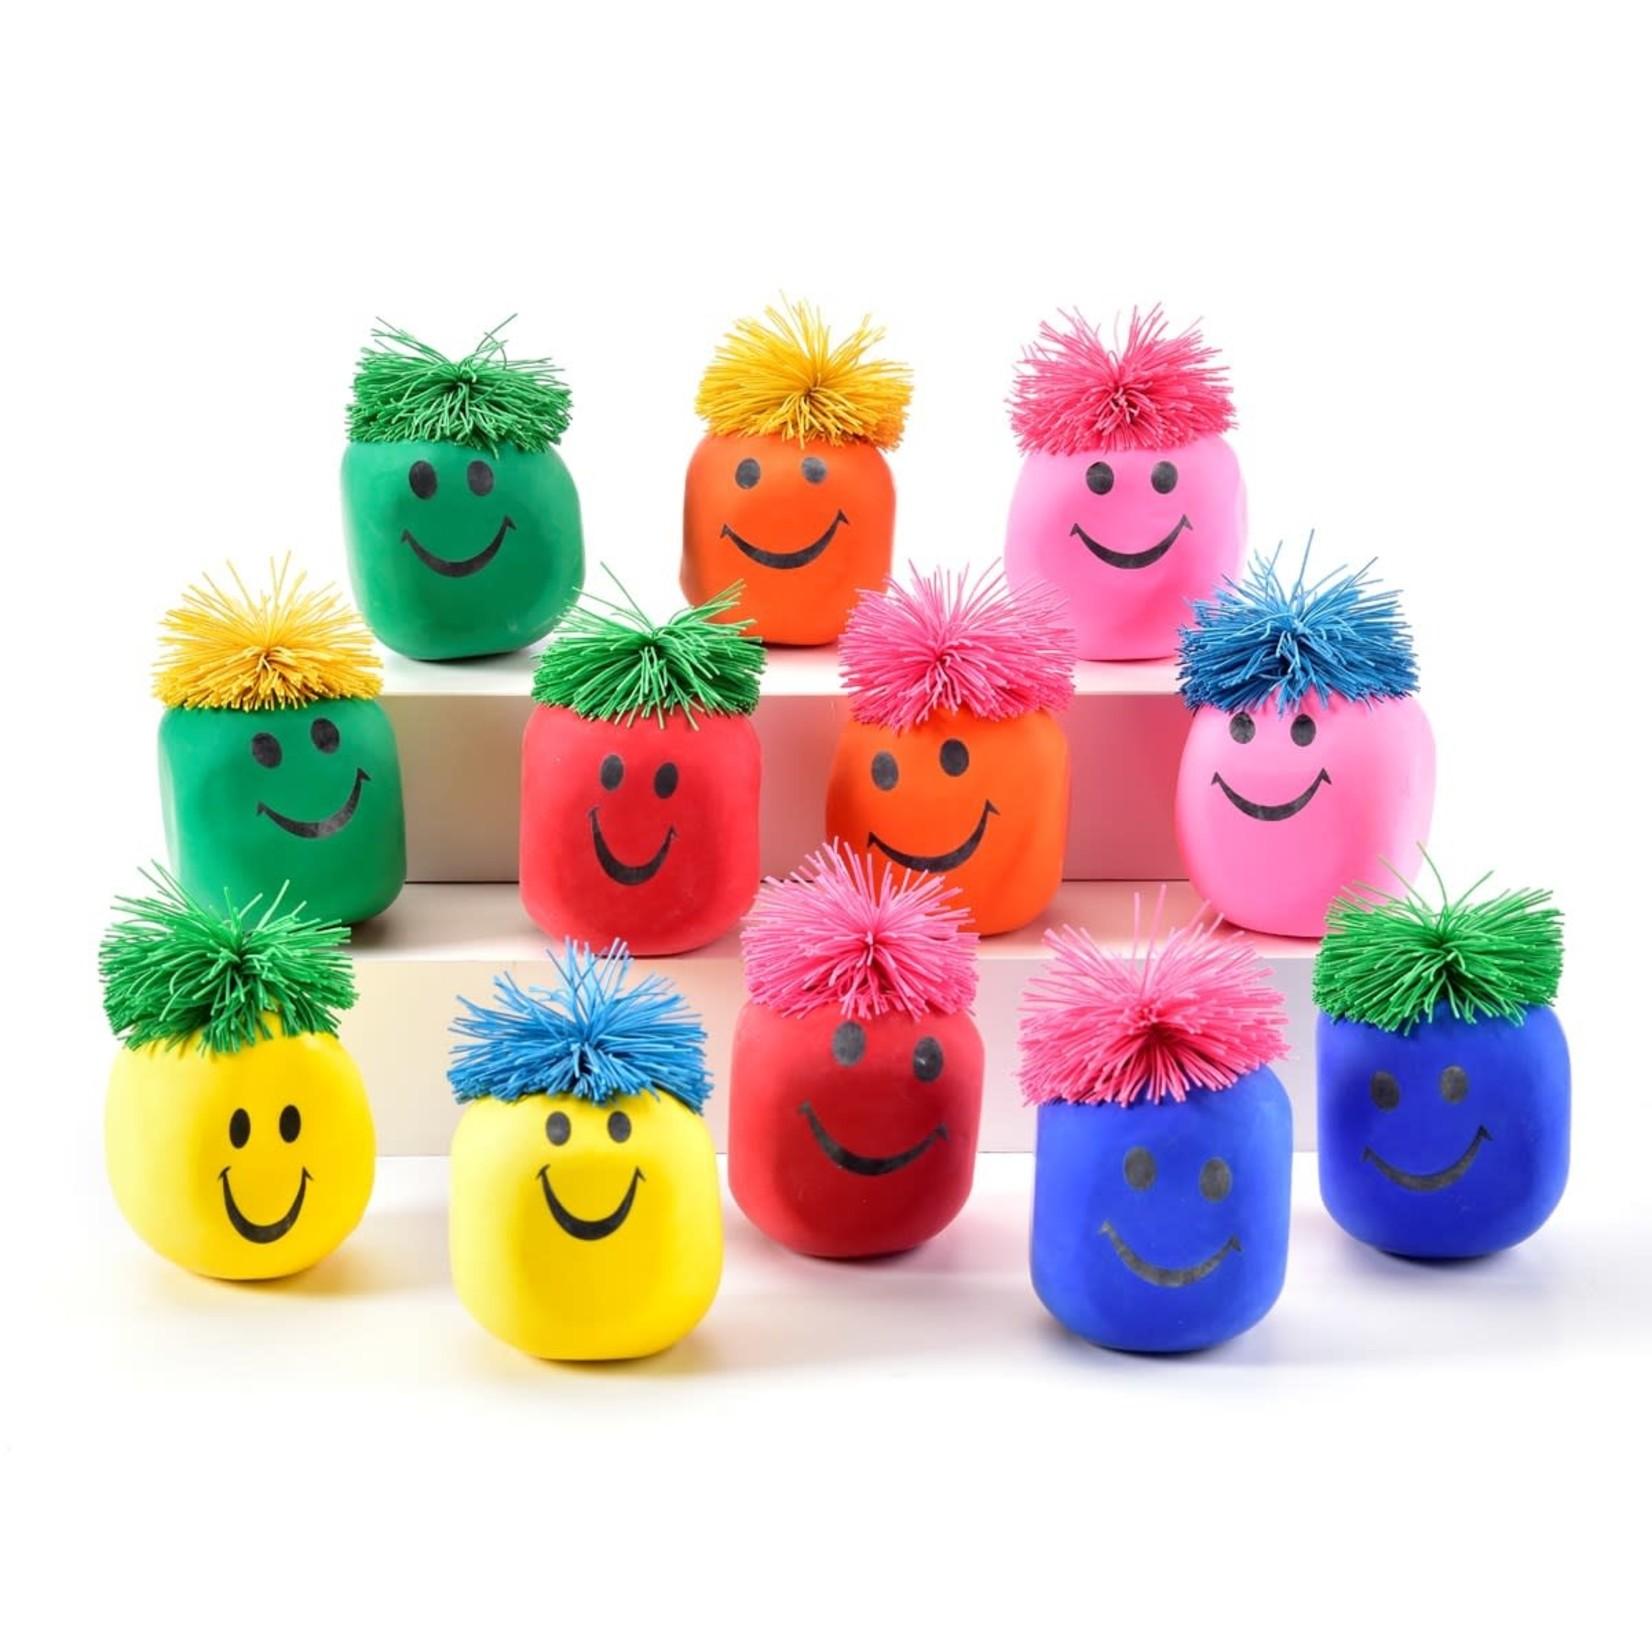 favourite things apparel Kids stress ball